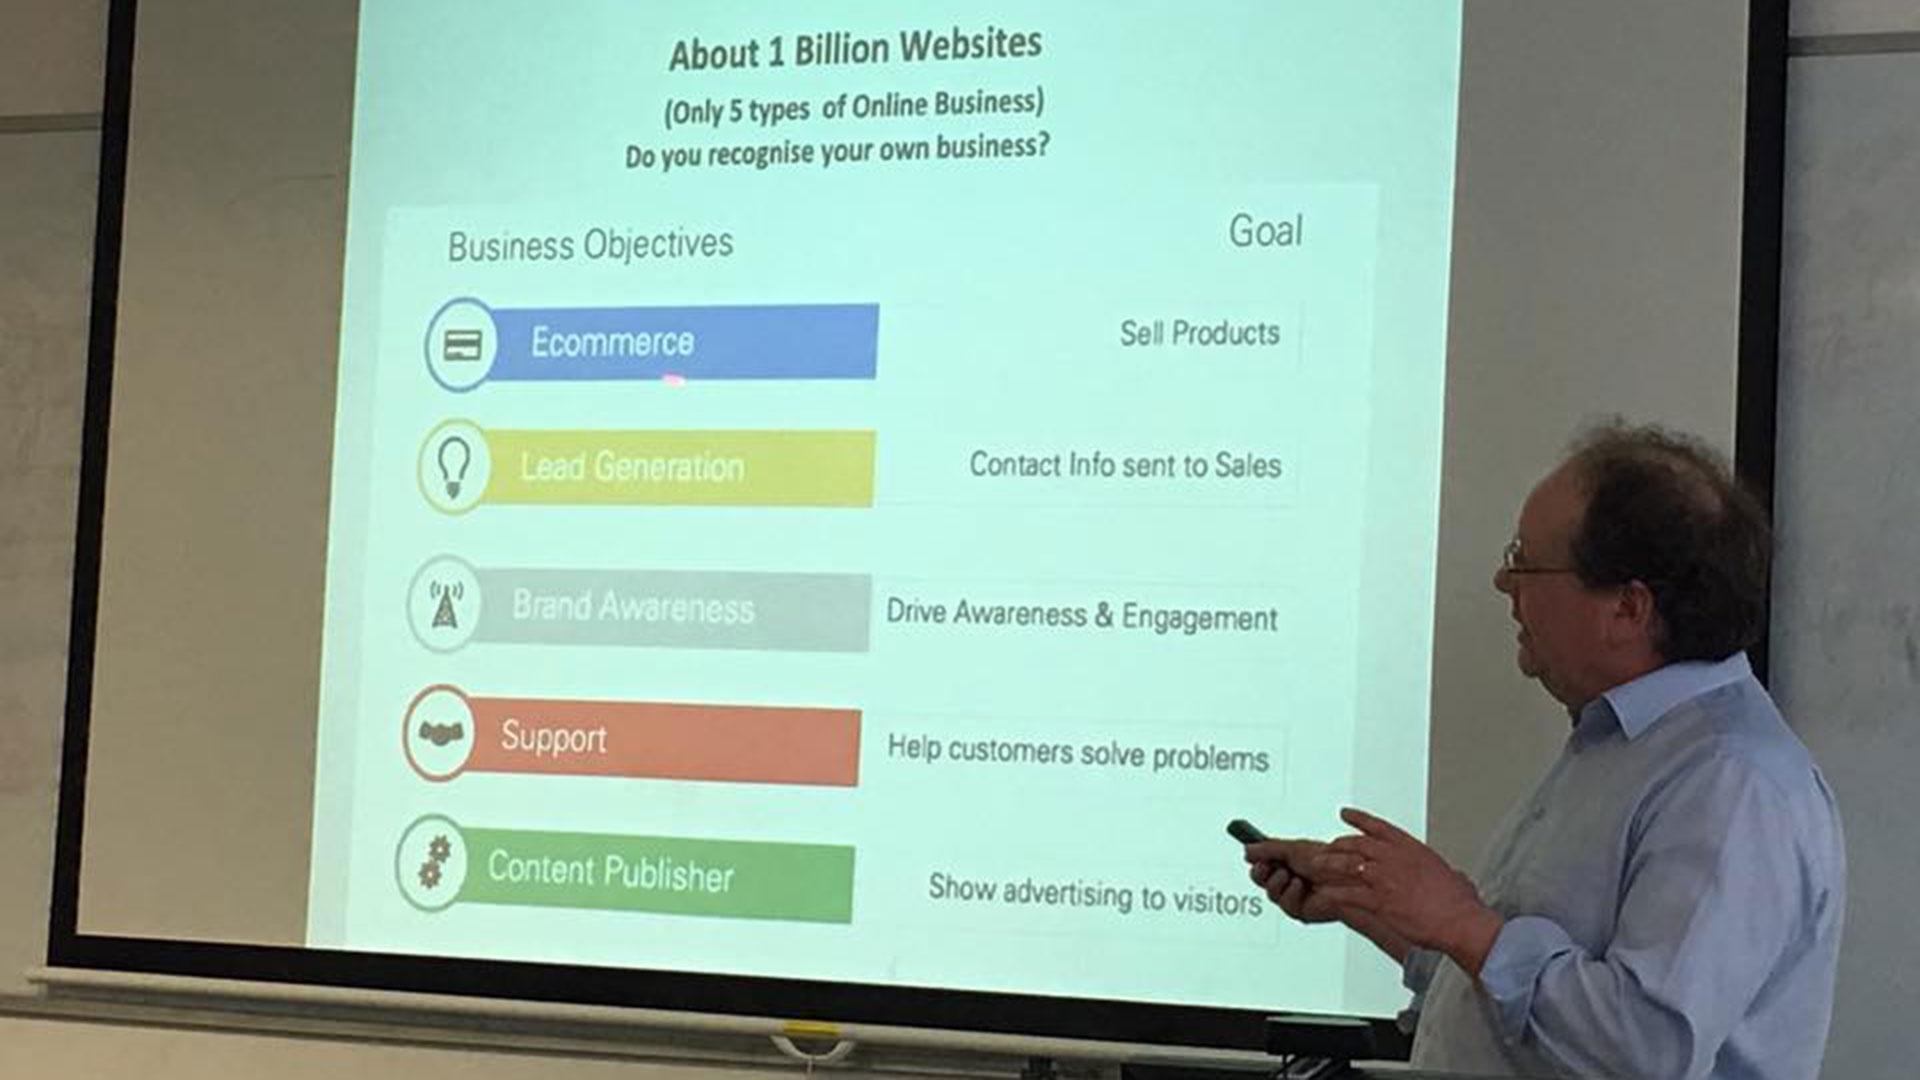 Marketing Your Business in a Digital World - Workshop 3